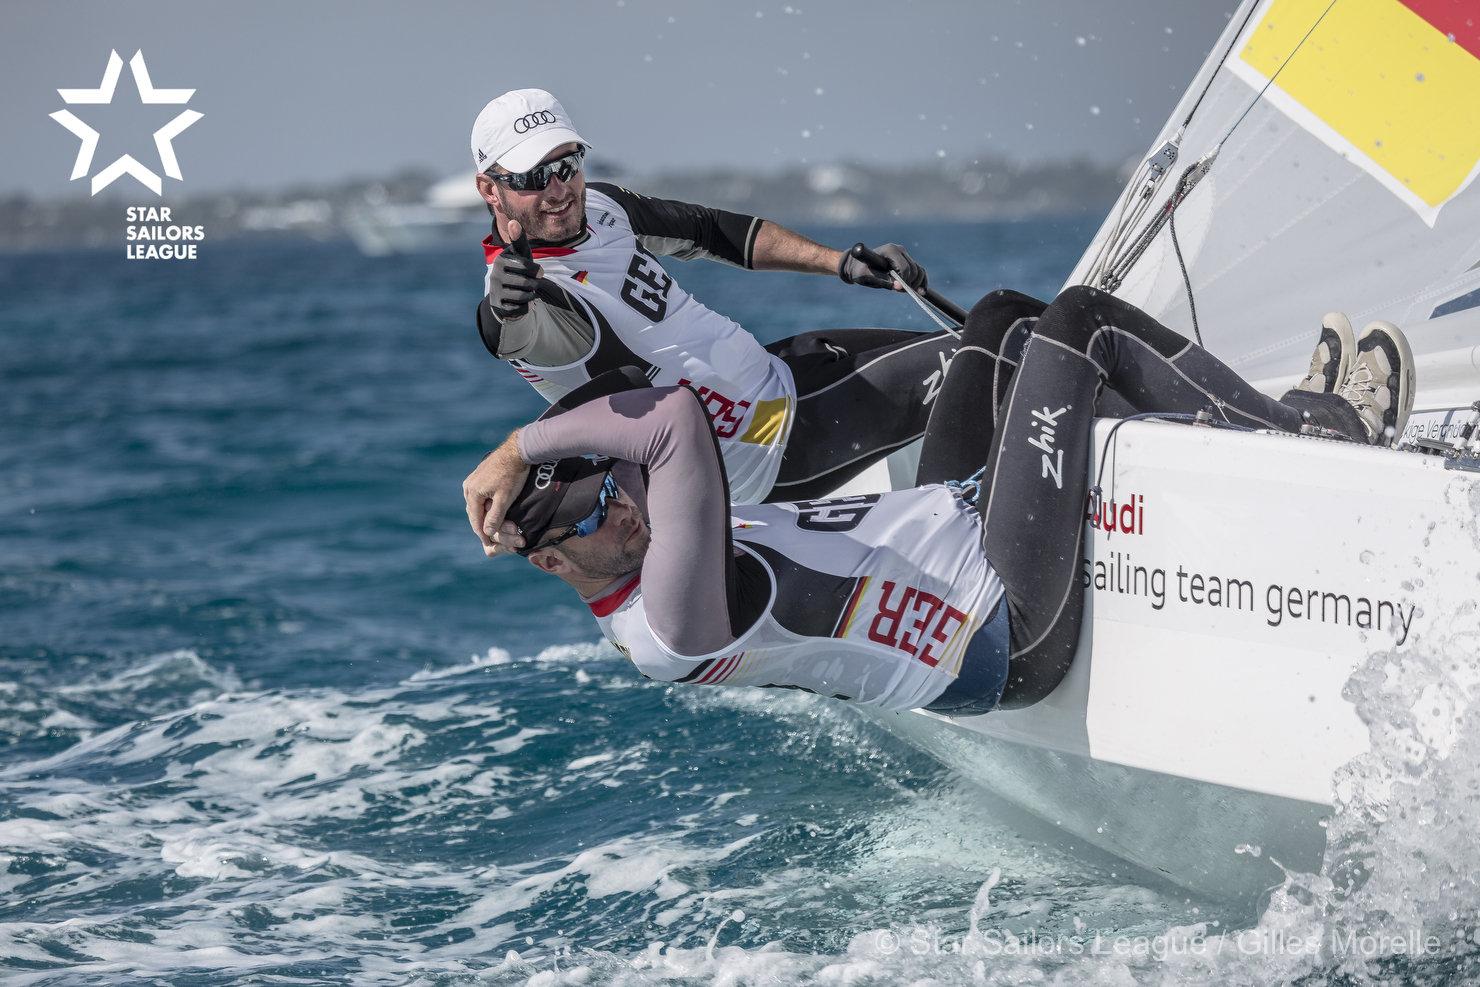 Bow: 05 // Sail: GER 8442 // Skipper: Johannes Polgar GER// Crew: Markus Koy GER